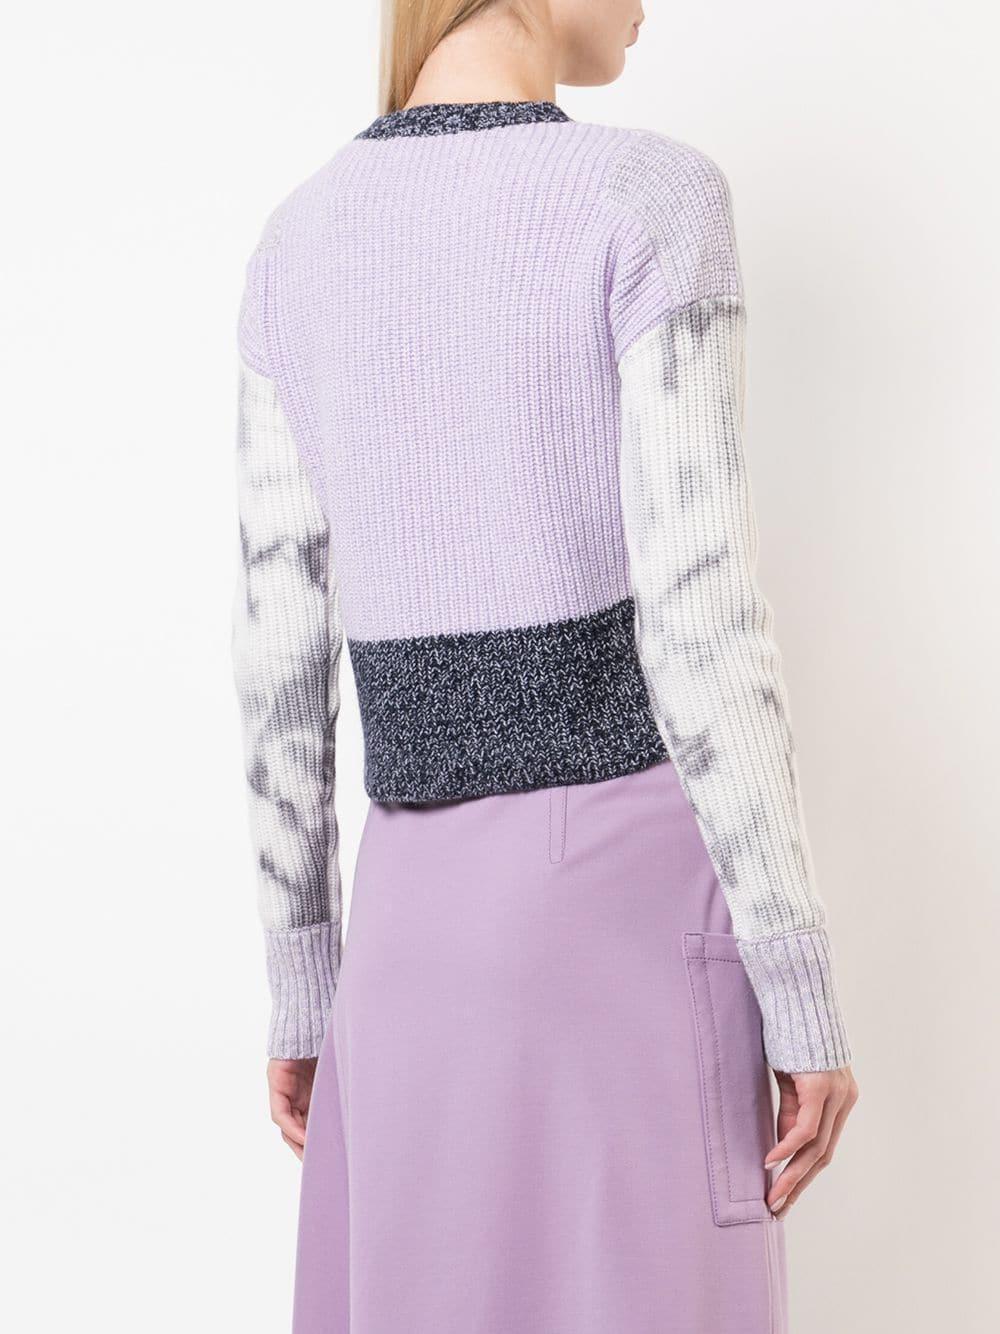 Cropped Jordan Fullscreen Knitted View Blue Lyst Sweater Contrast Zoe qtv4x7Cv